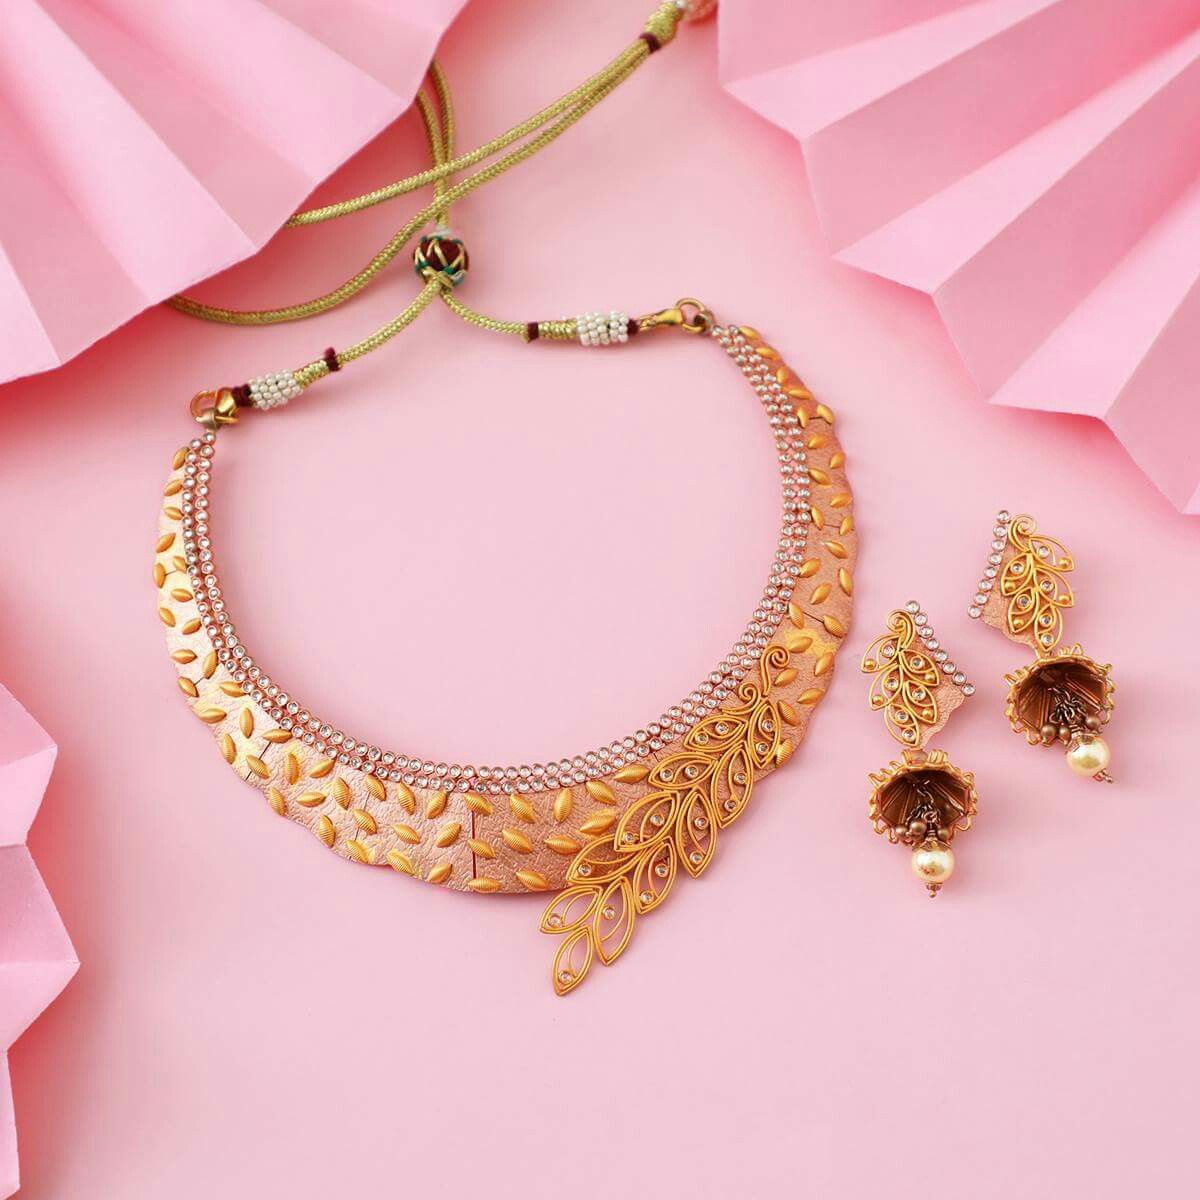 Pin by Rehma Siraj on jewellery | Pinterest | Gold jewellery ...